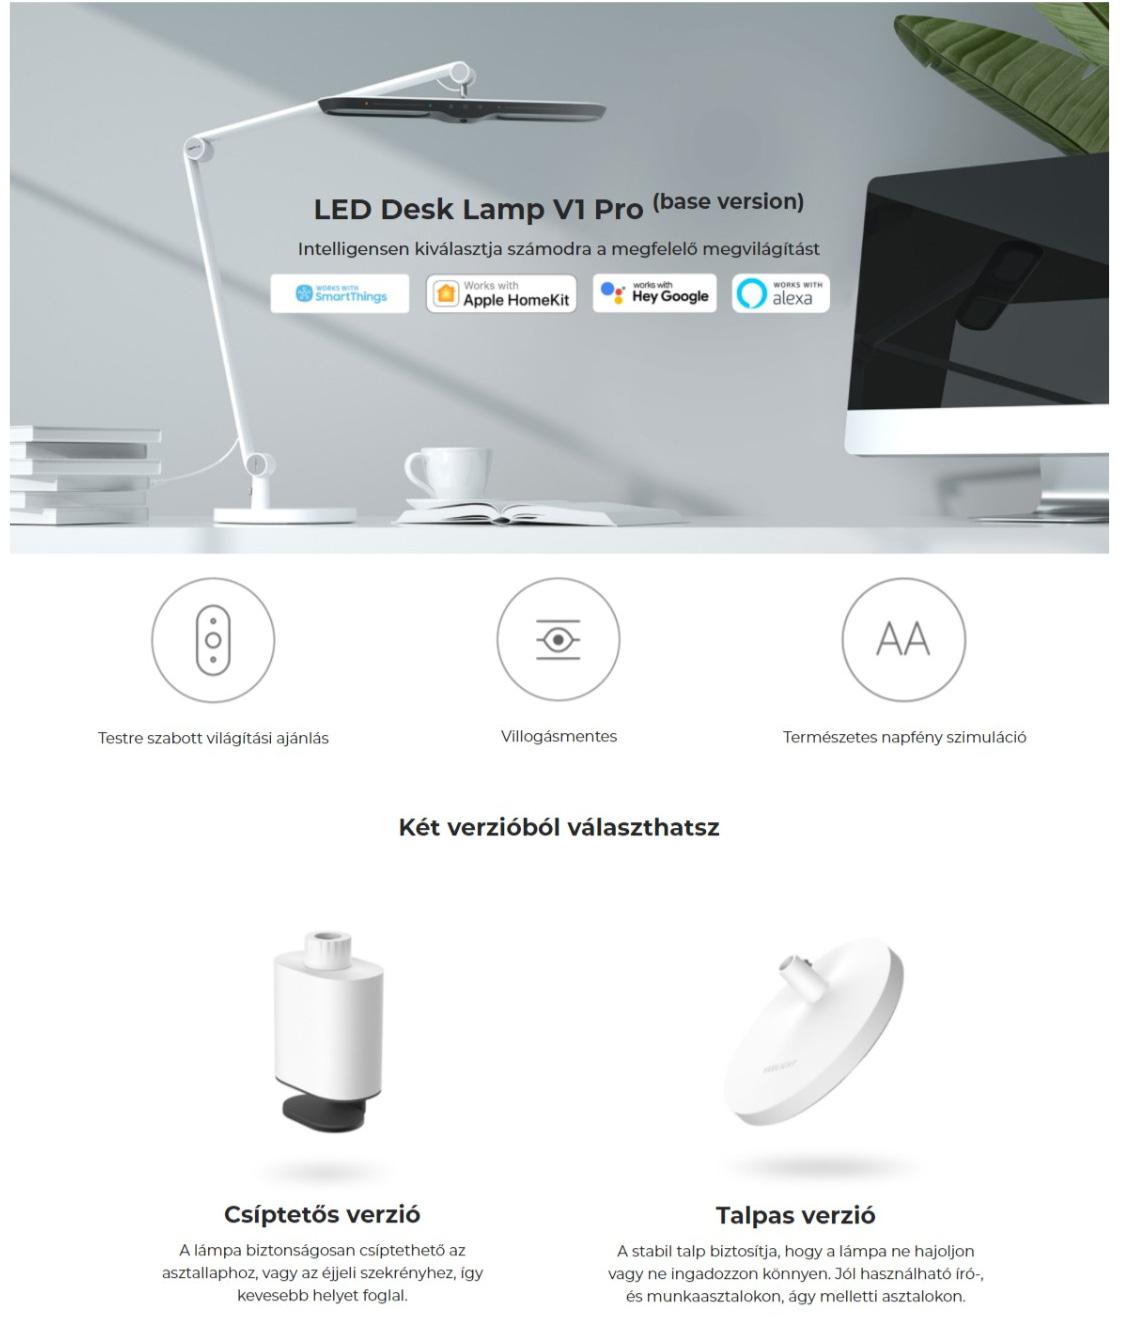 Xiaomi Yeelight LED Desk Lamp V1 Pro (base version) asztali lámpa